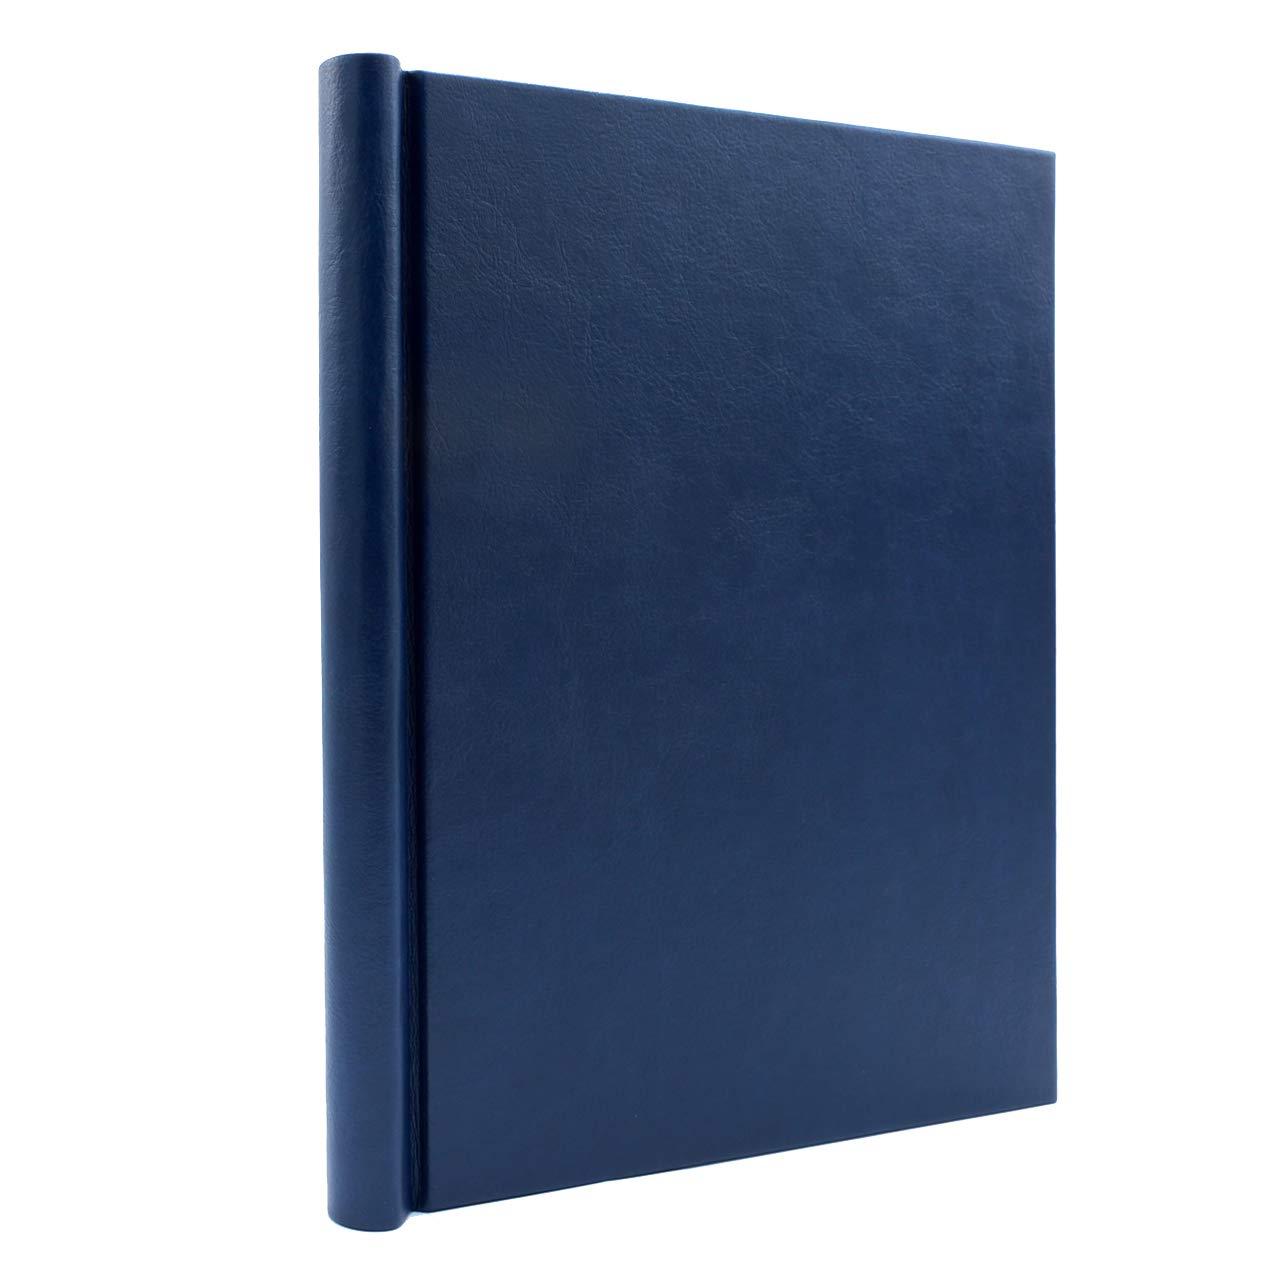 Bindertek 1-Inch Premium Clampback Thesis Binder, Soft Leather Effect, Blue (TBXS-L-BL) by Bindertek